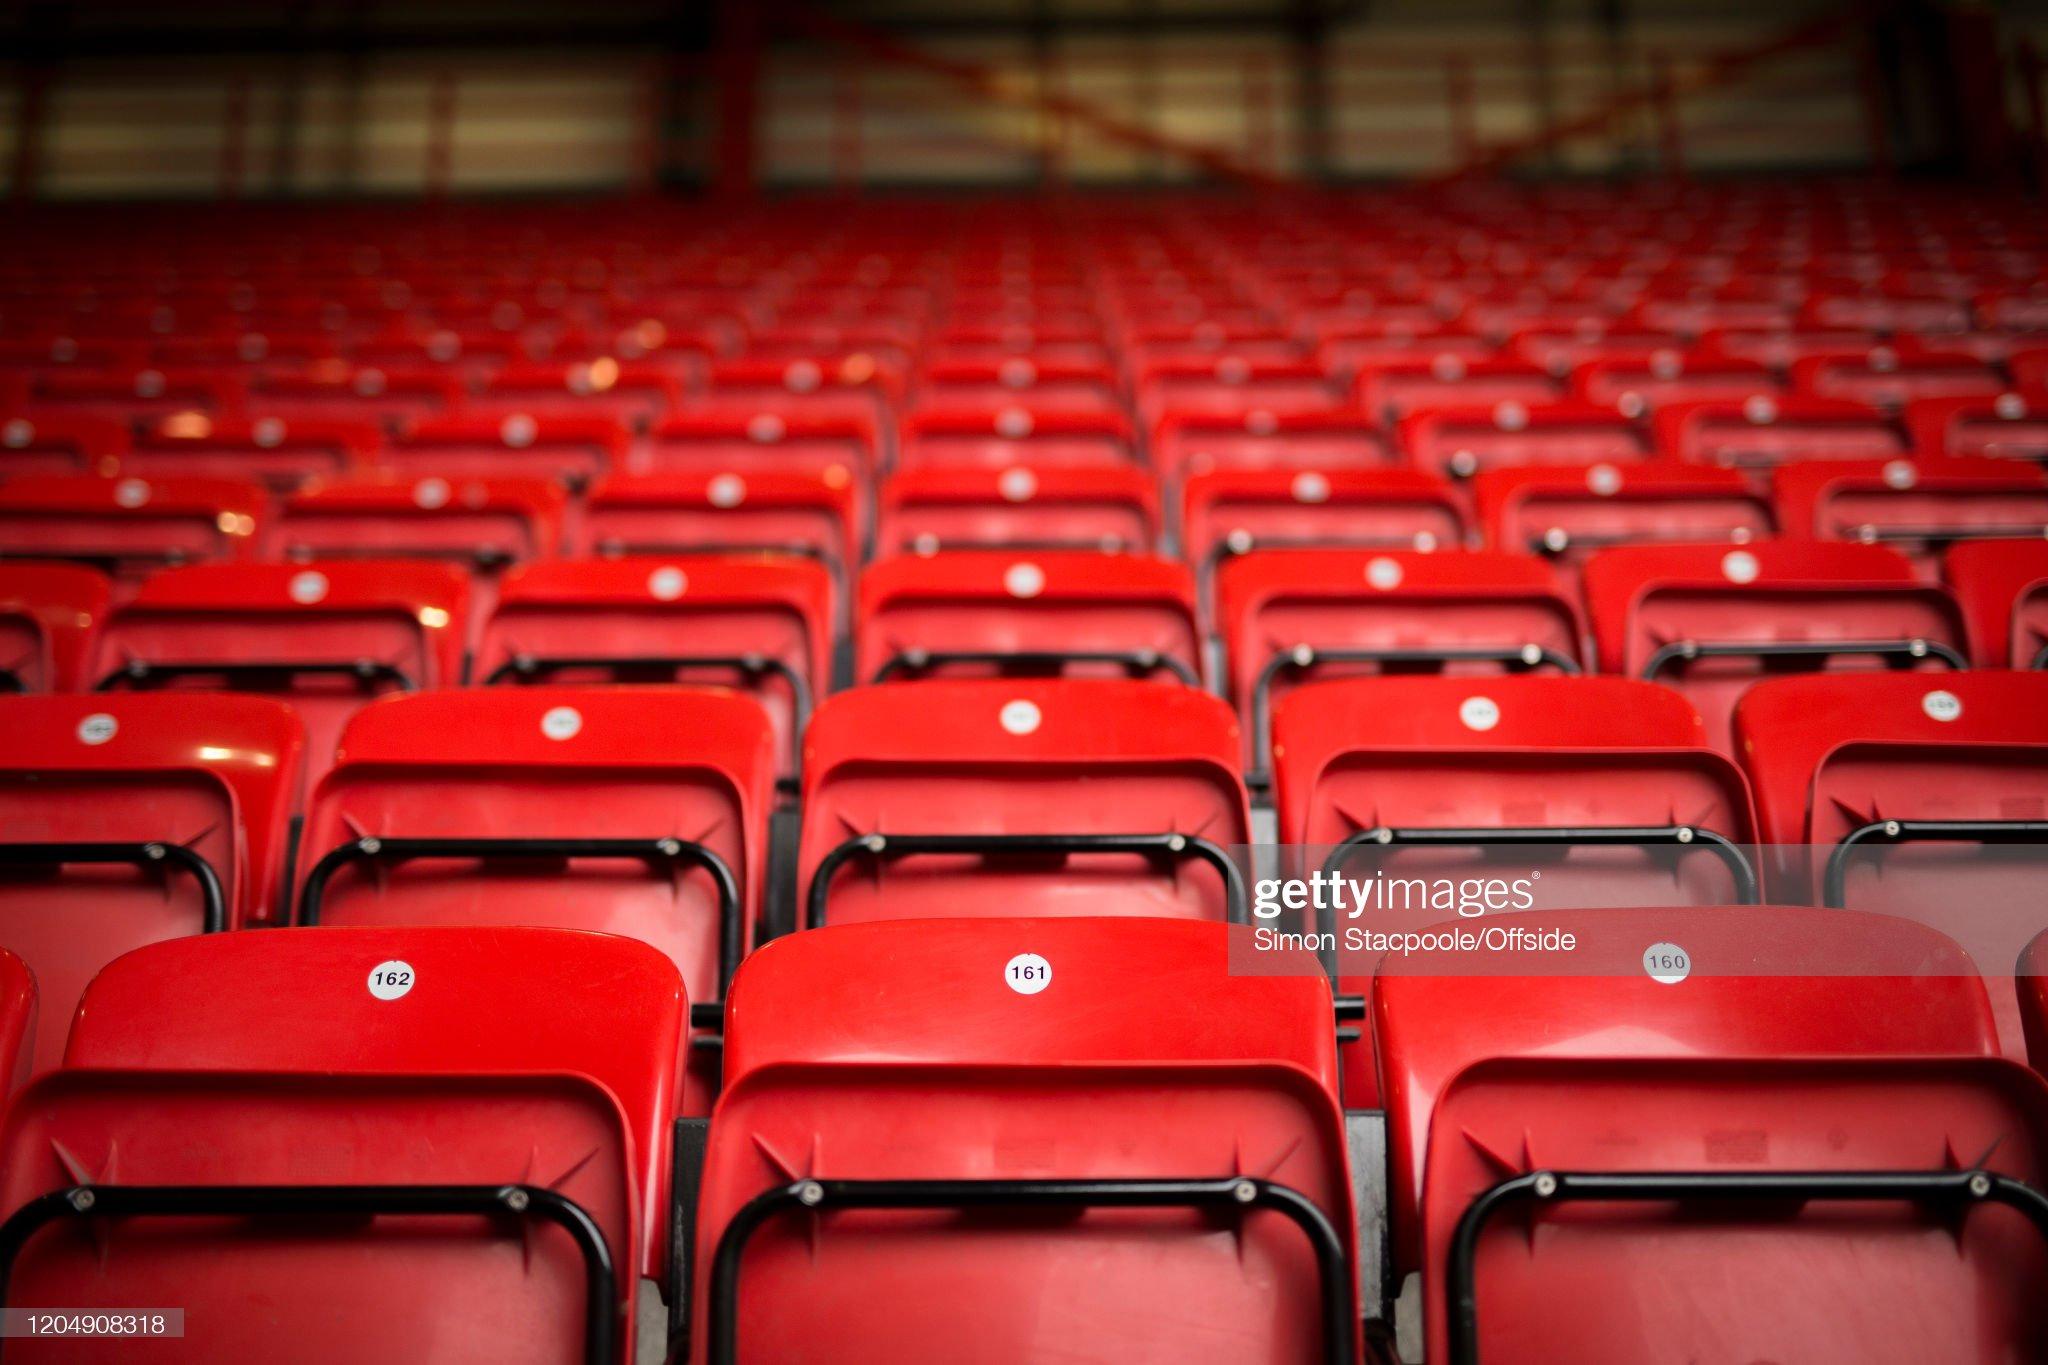 When will fans return to Premier League stadiums?